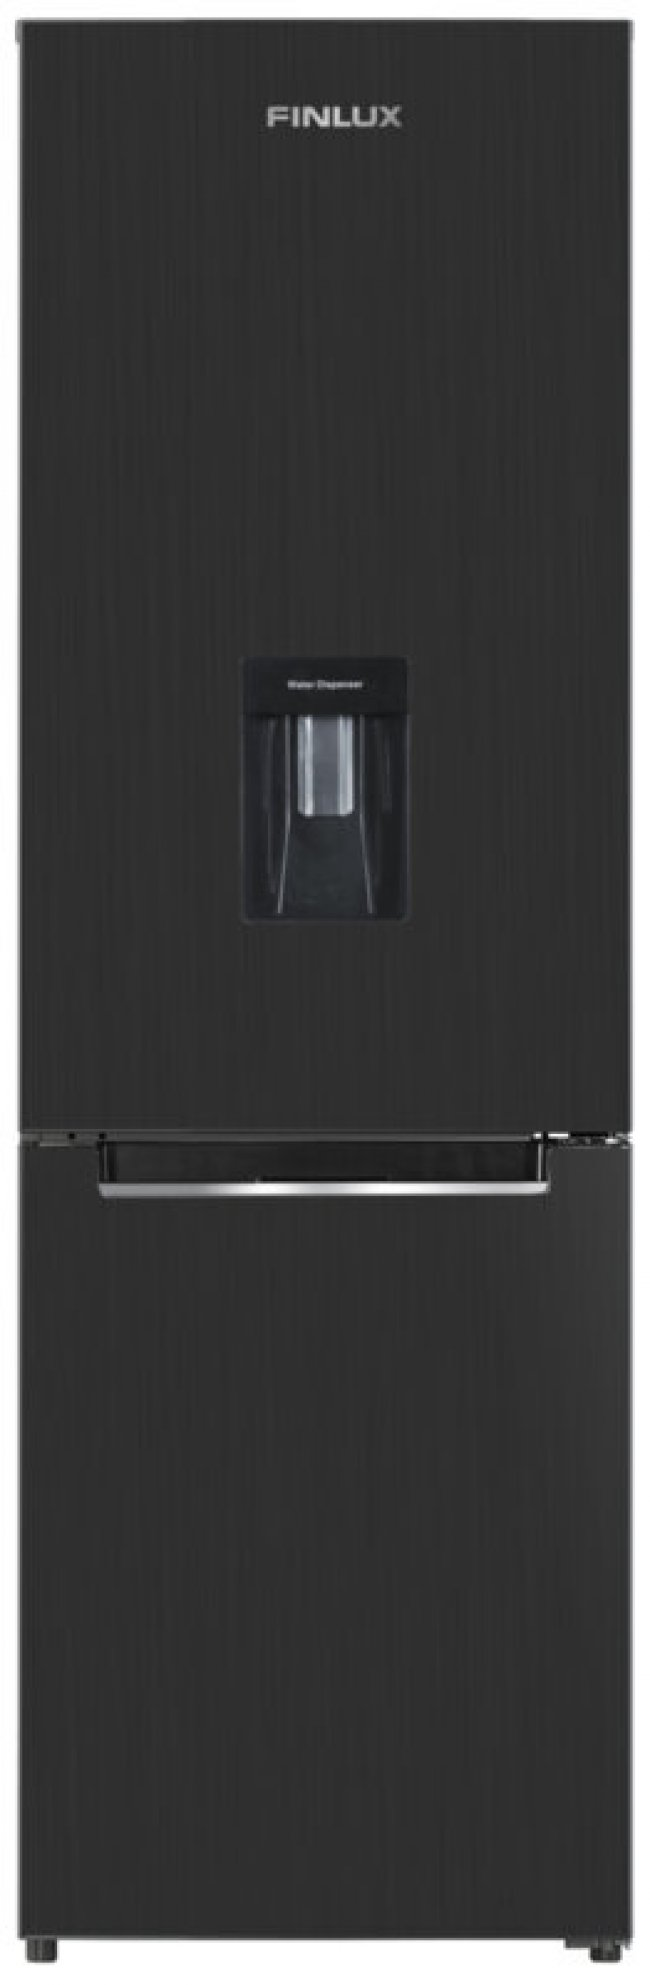 Хладилник Finlux FBN-300DIX/DARK